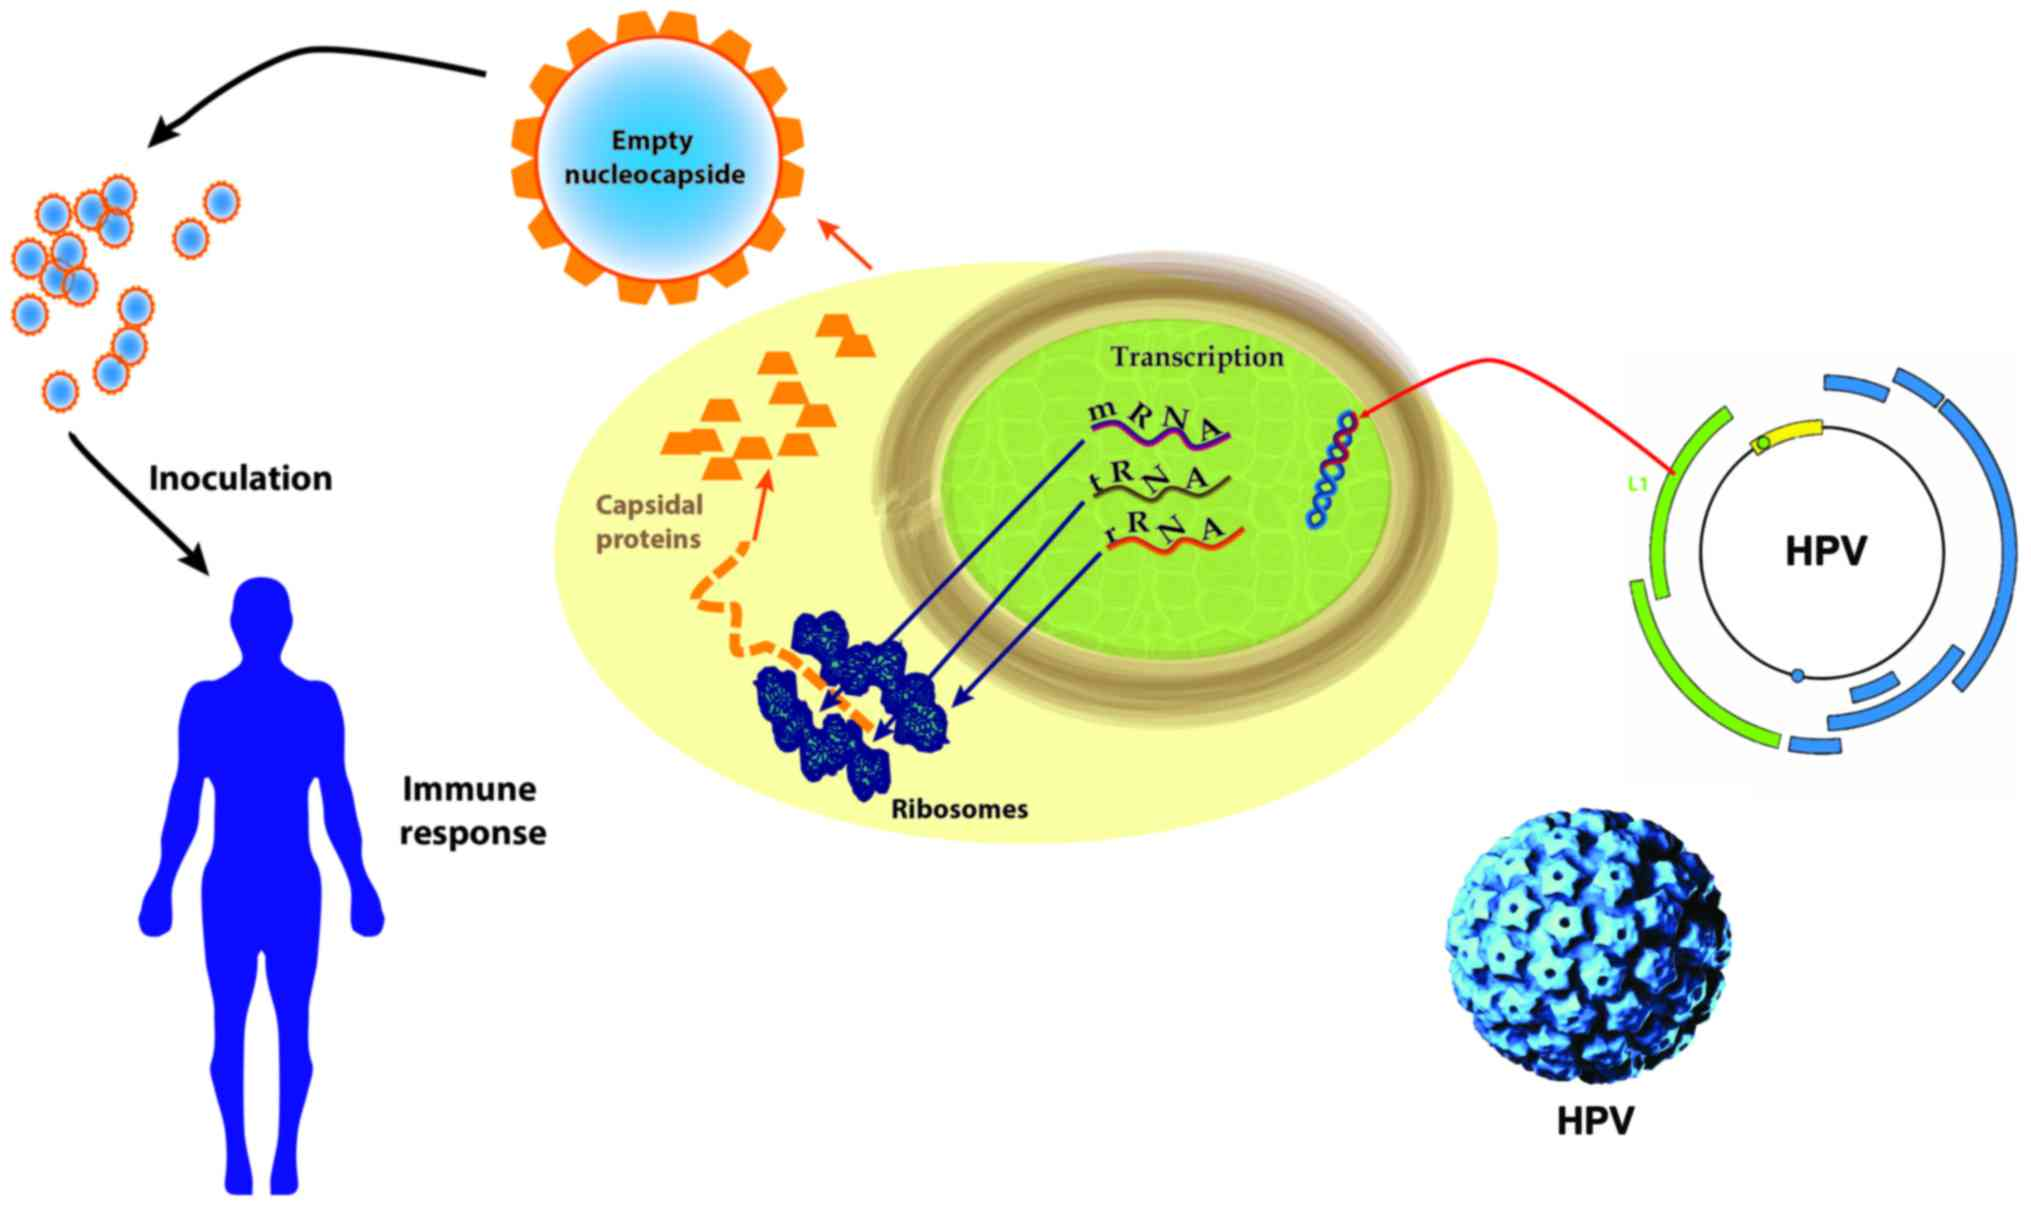 Human Papilloma Virus (HPV) si REVOLUTIA SEXUALA | SACCSIV - blog ortodox